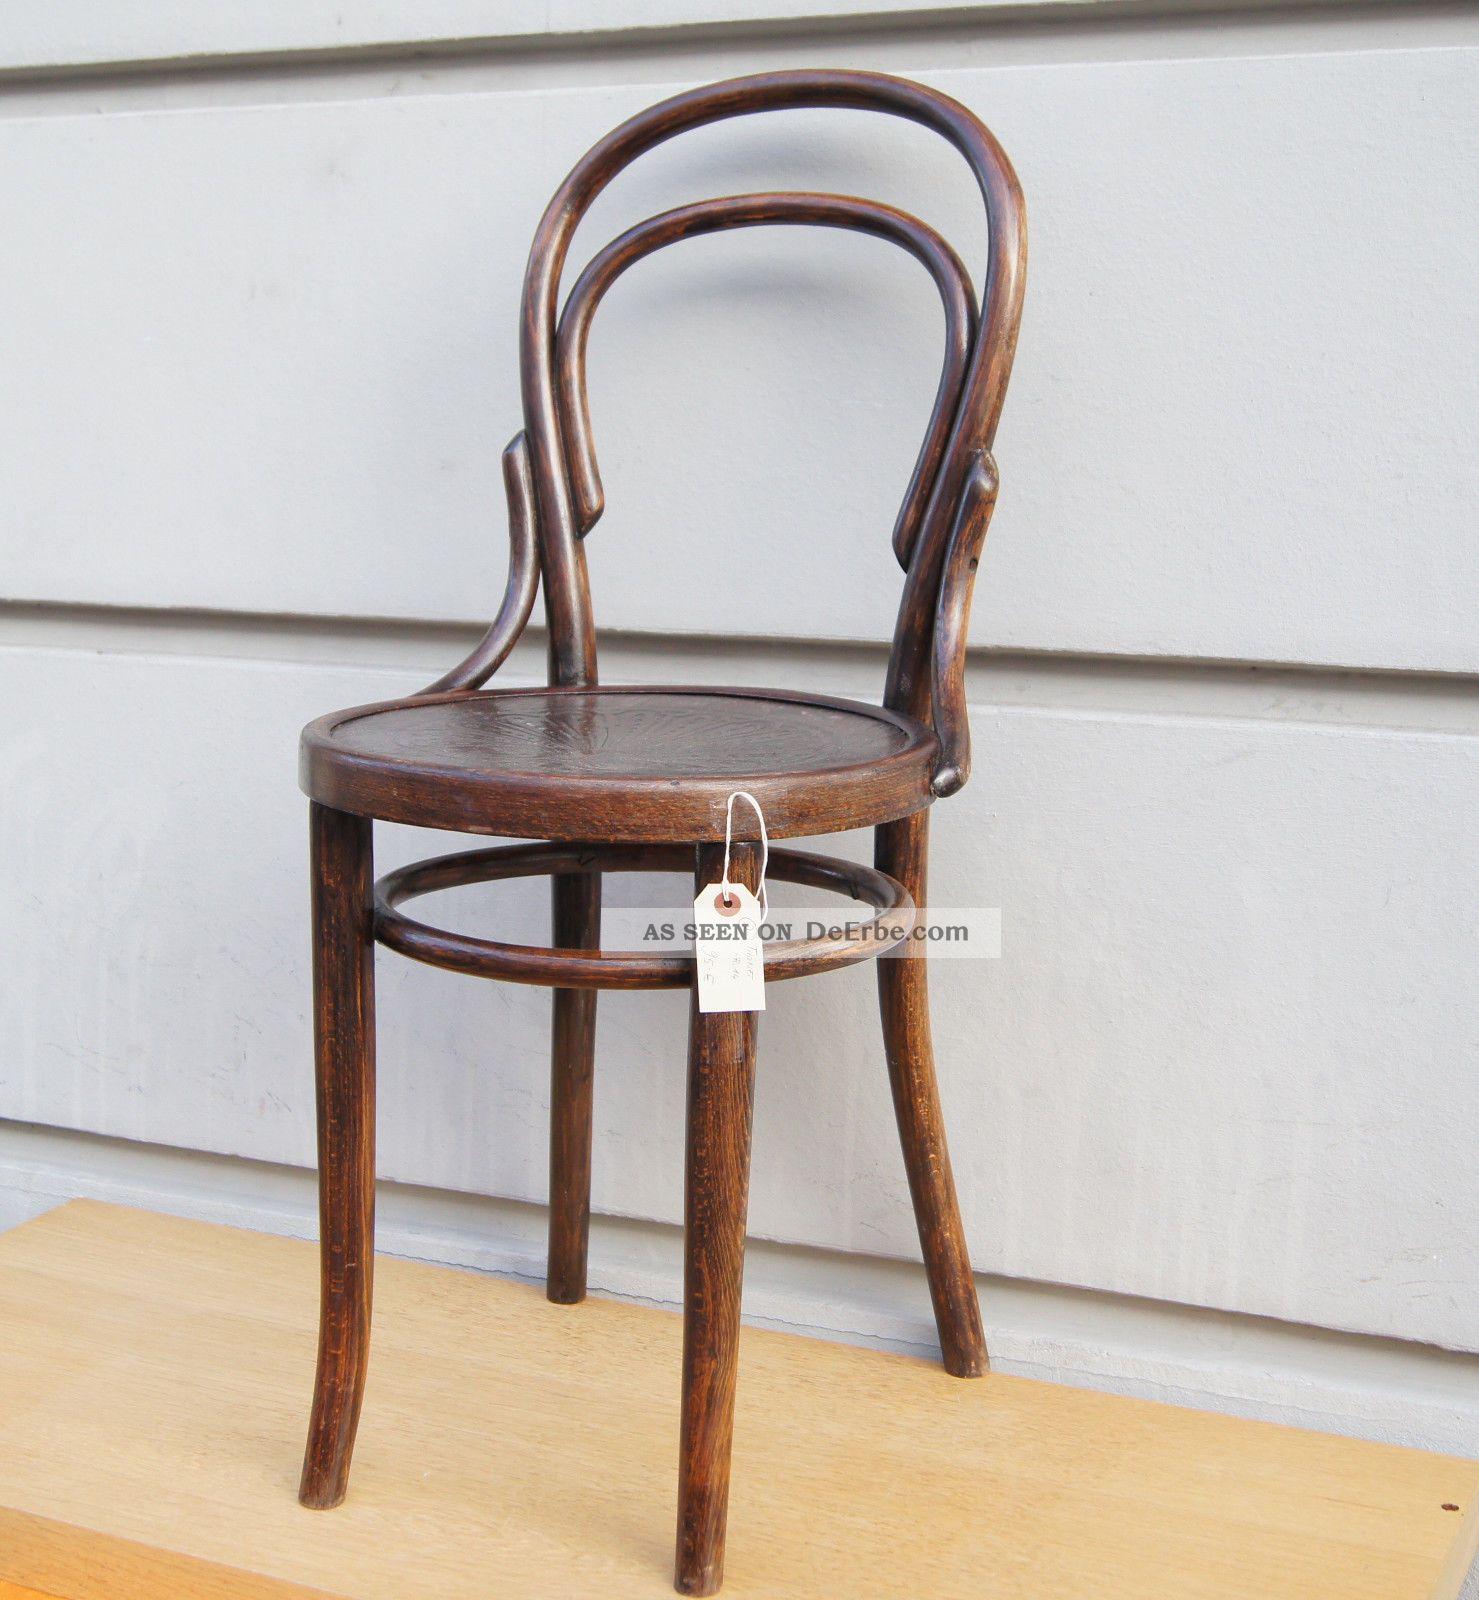 thonet antik with thonet antik finest thonet antik uveg teteju kisasztal vaterahu kp with. Black Bedroom Furniture Sets. Home Design Ideas